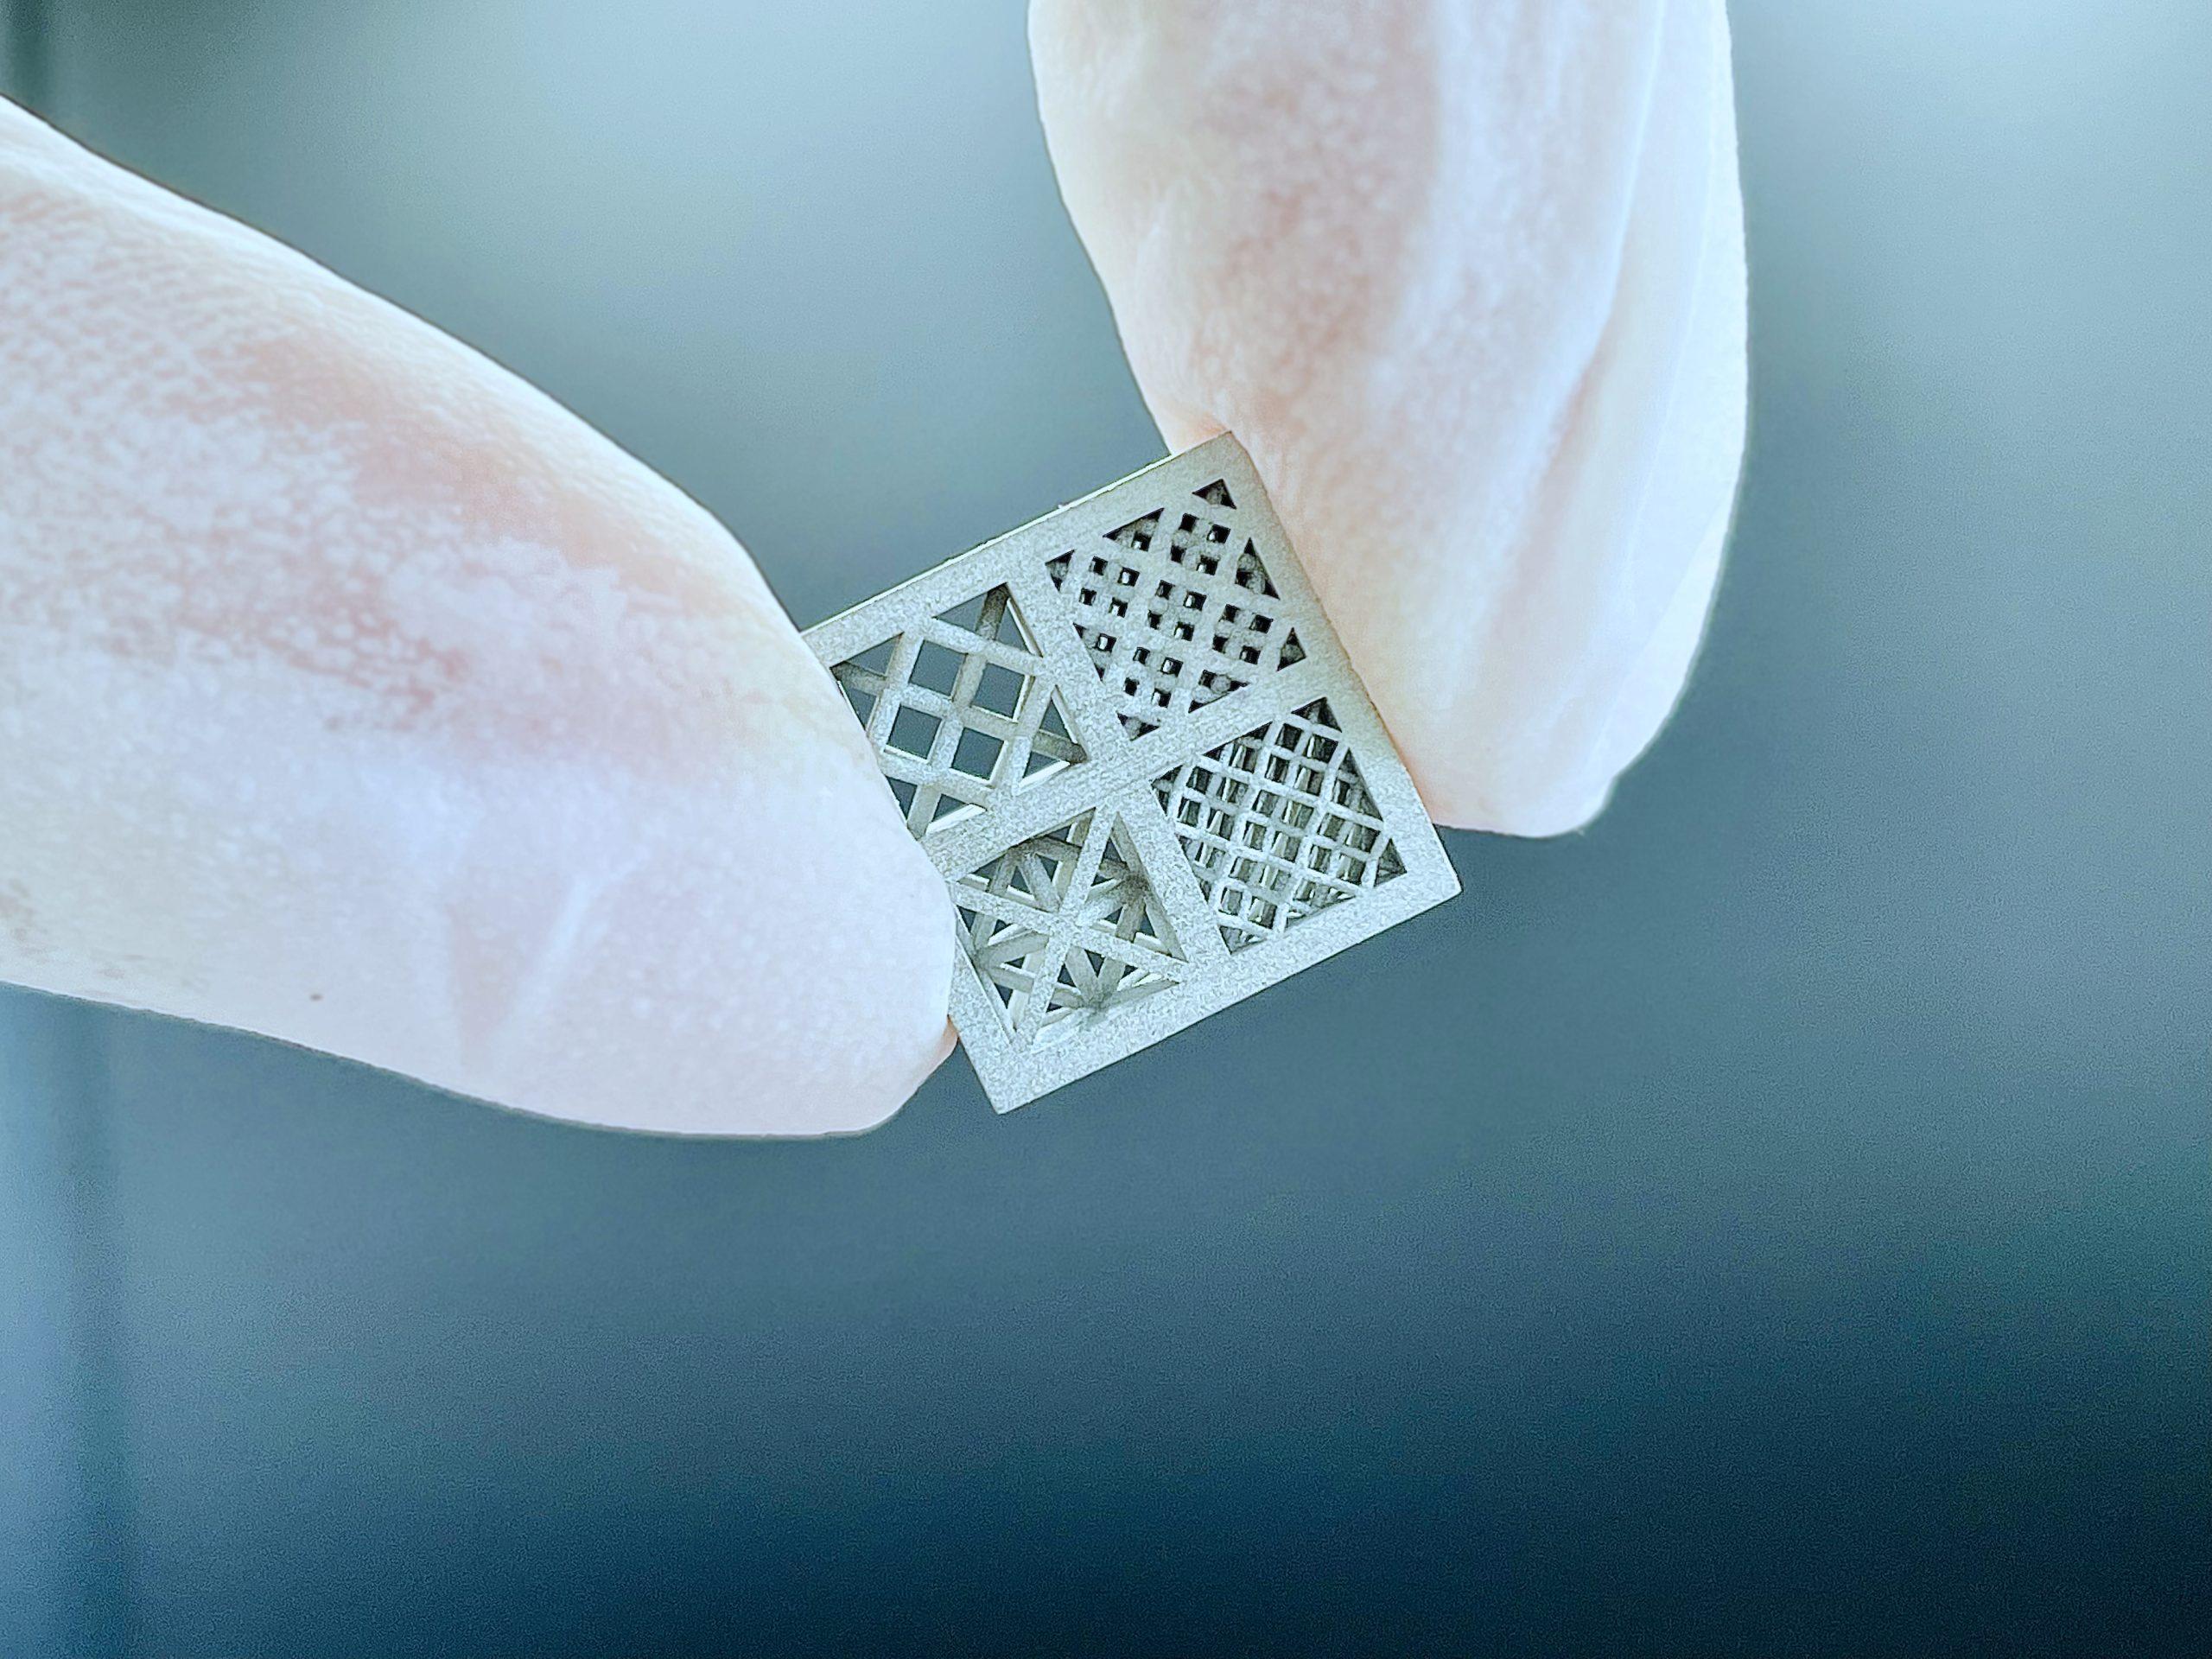 A 3D printed part produced via LMM. Photo via Incus.